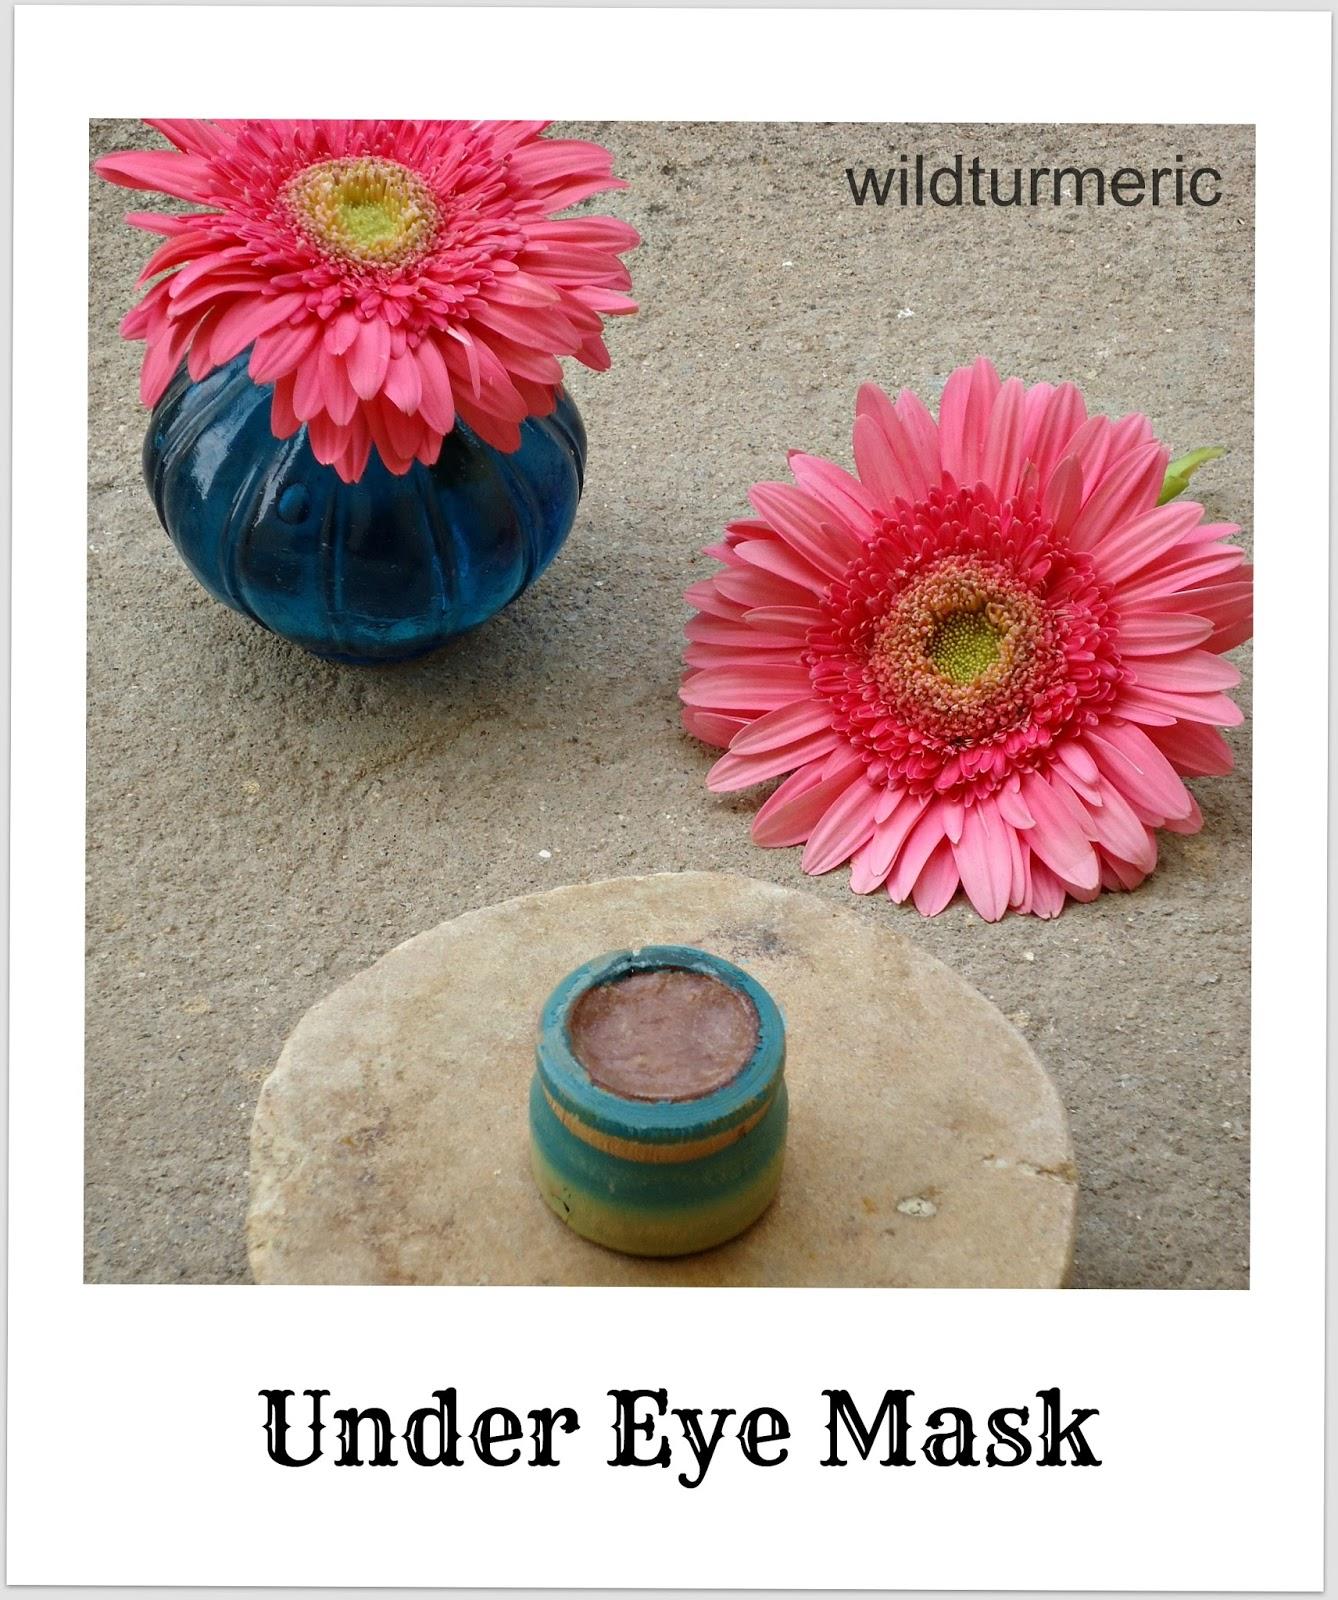 Diy Homemade Malai And Dates Eye Mask Recipe Wildturmeric